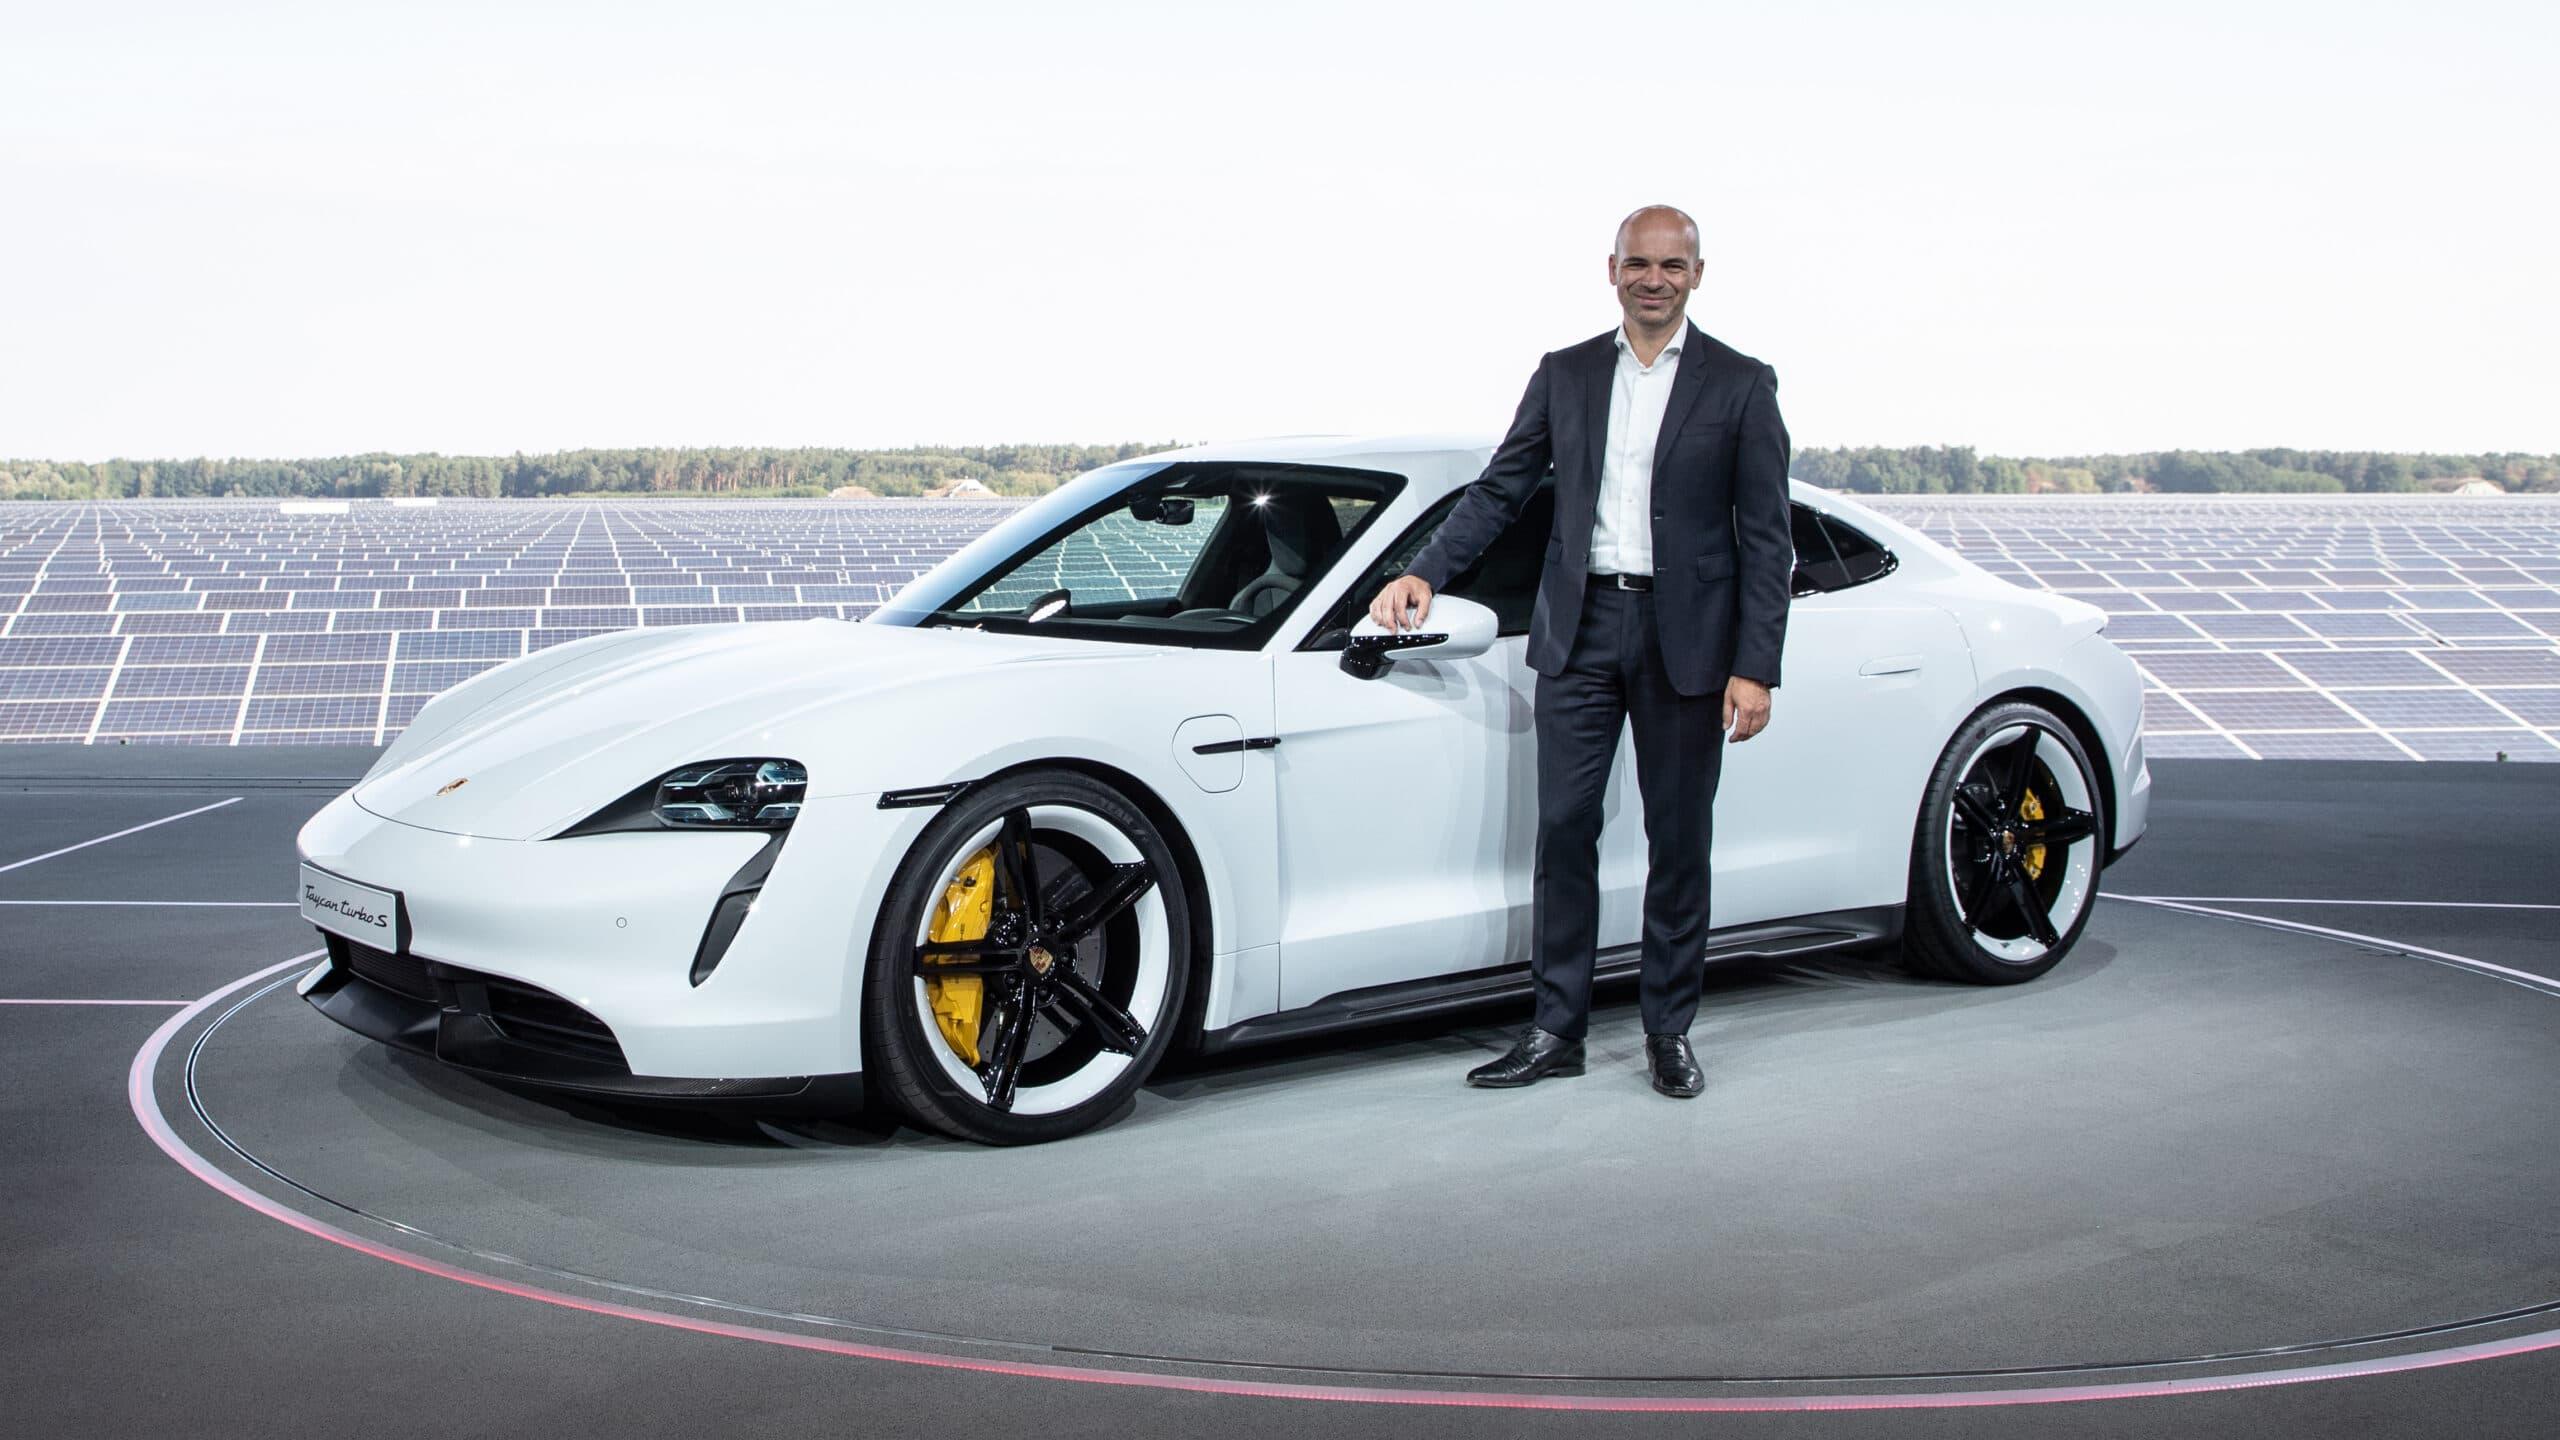 Manfred Harrer, executivo da Porsche contratado pela Apple